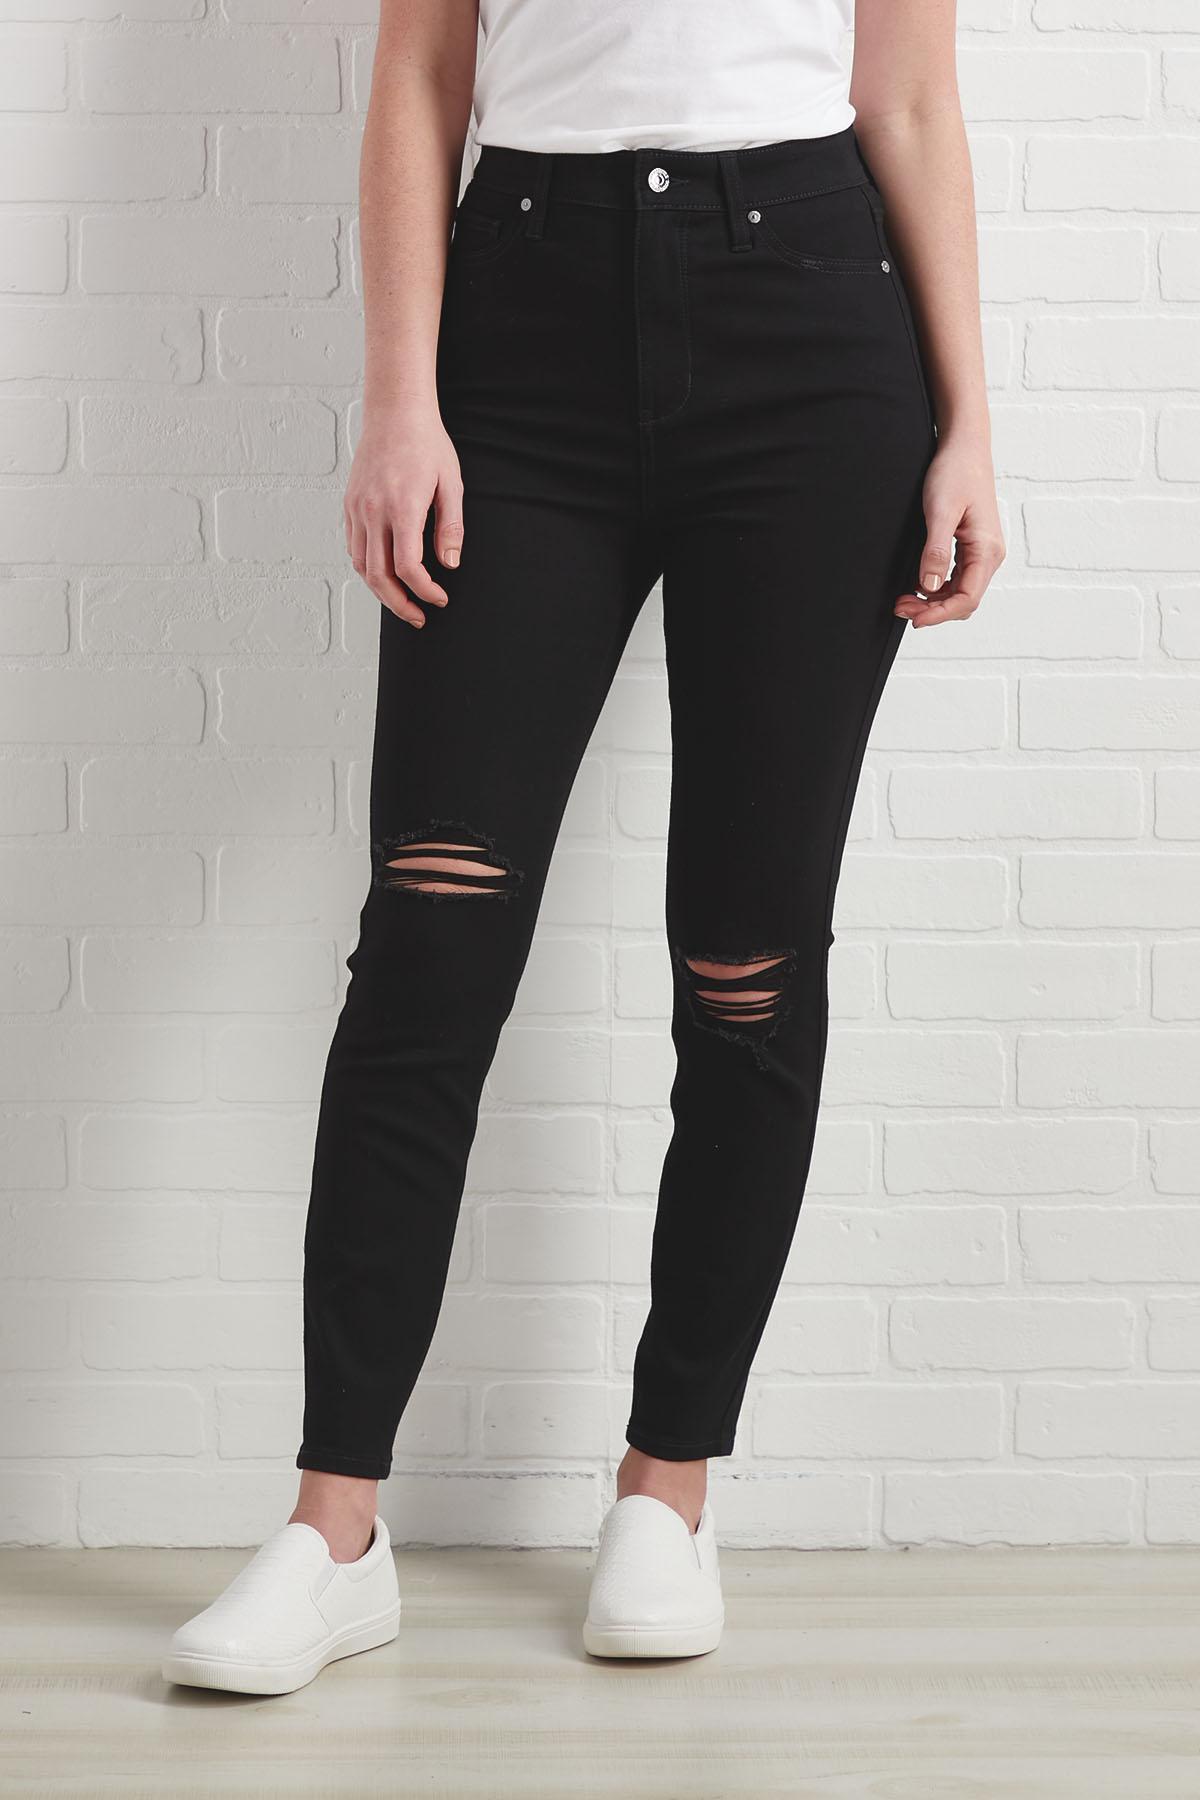 Meet Your Knee- Ds Jeans